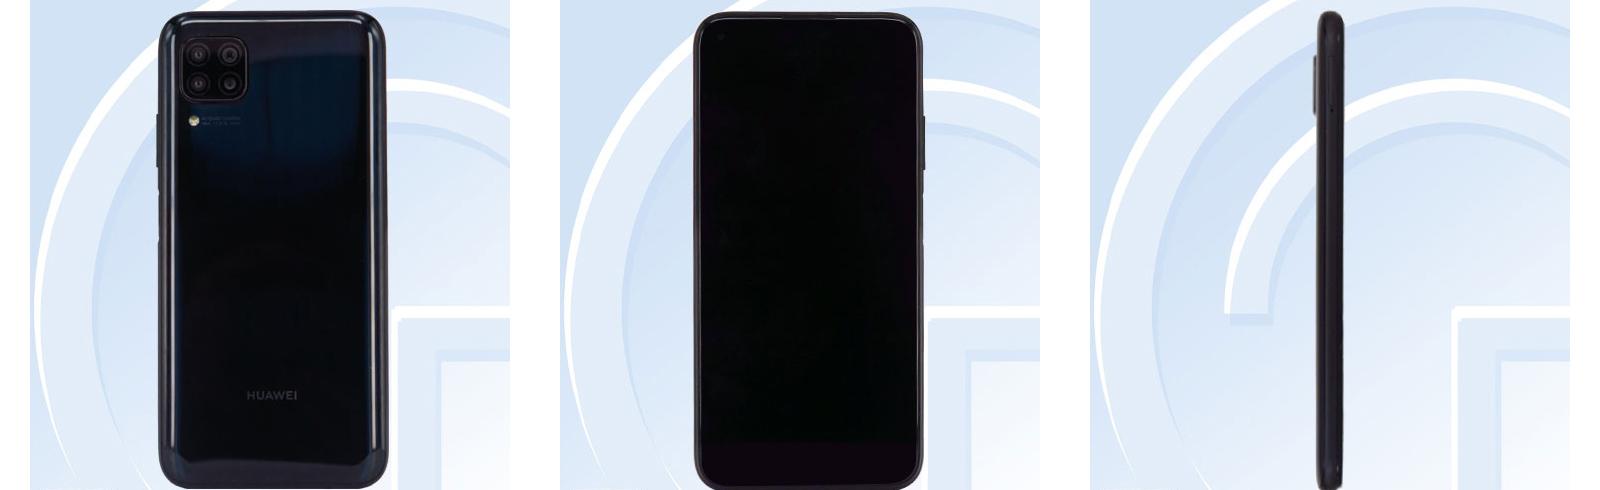 TENAA certifies the Huawei JNY-AL10, which is probably the Huawei nova 6 SE